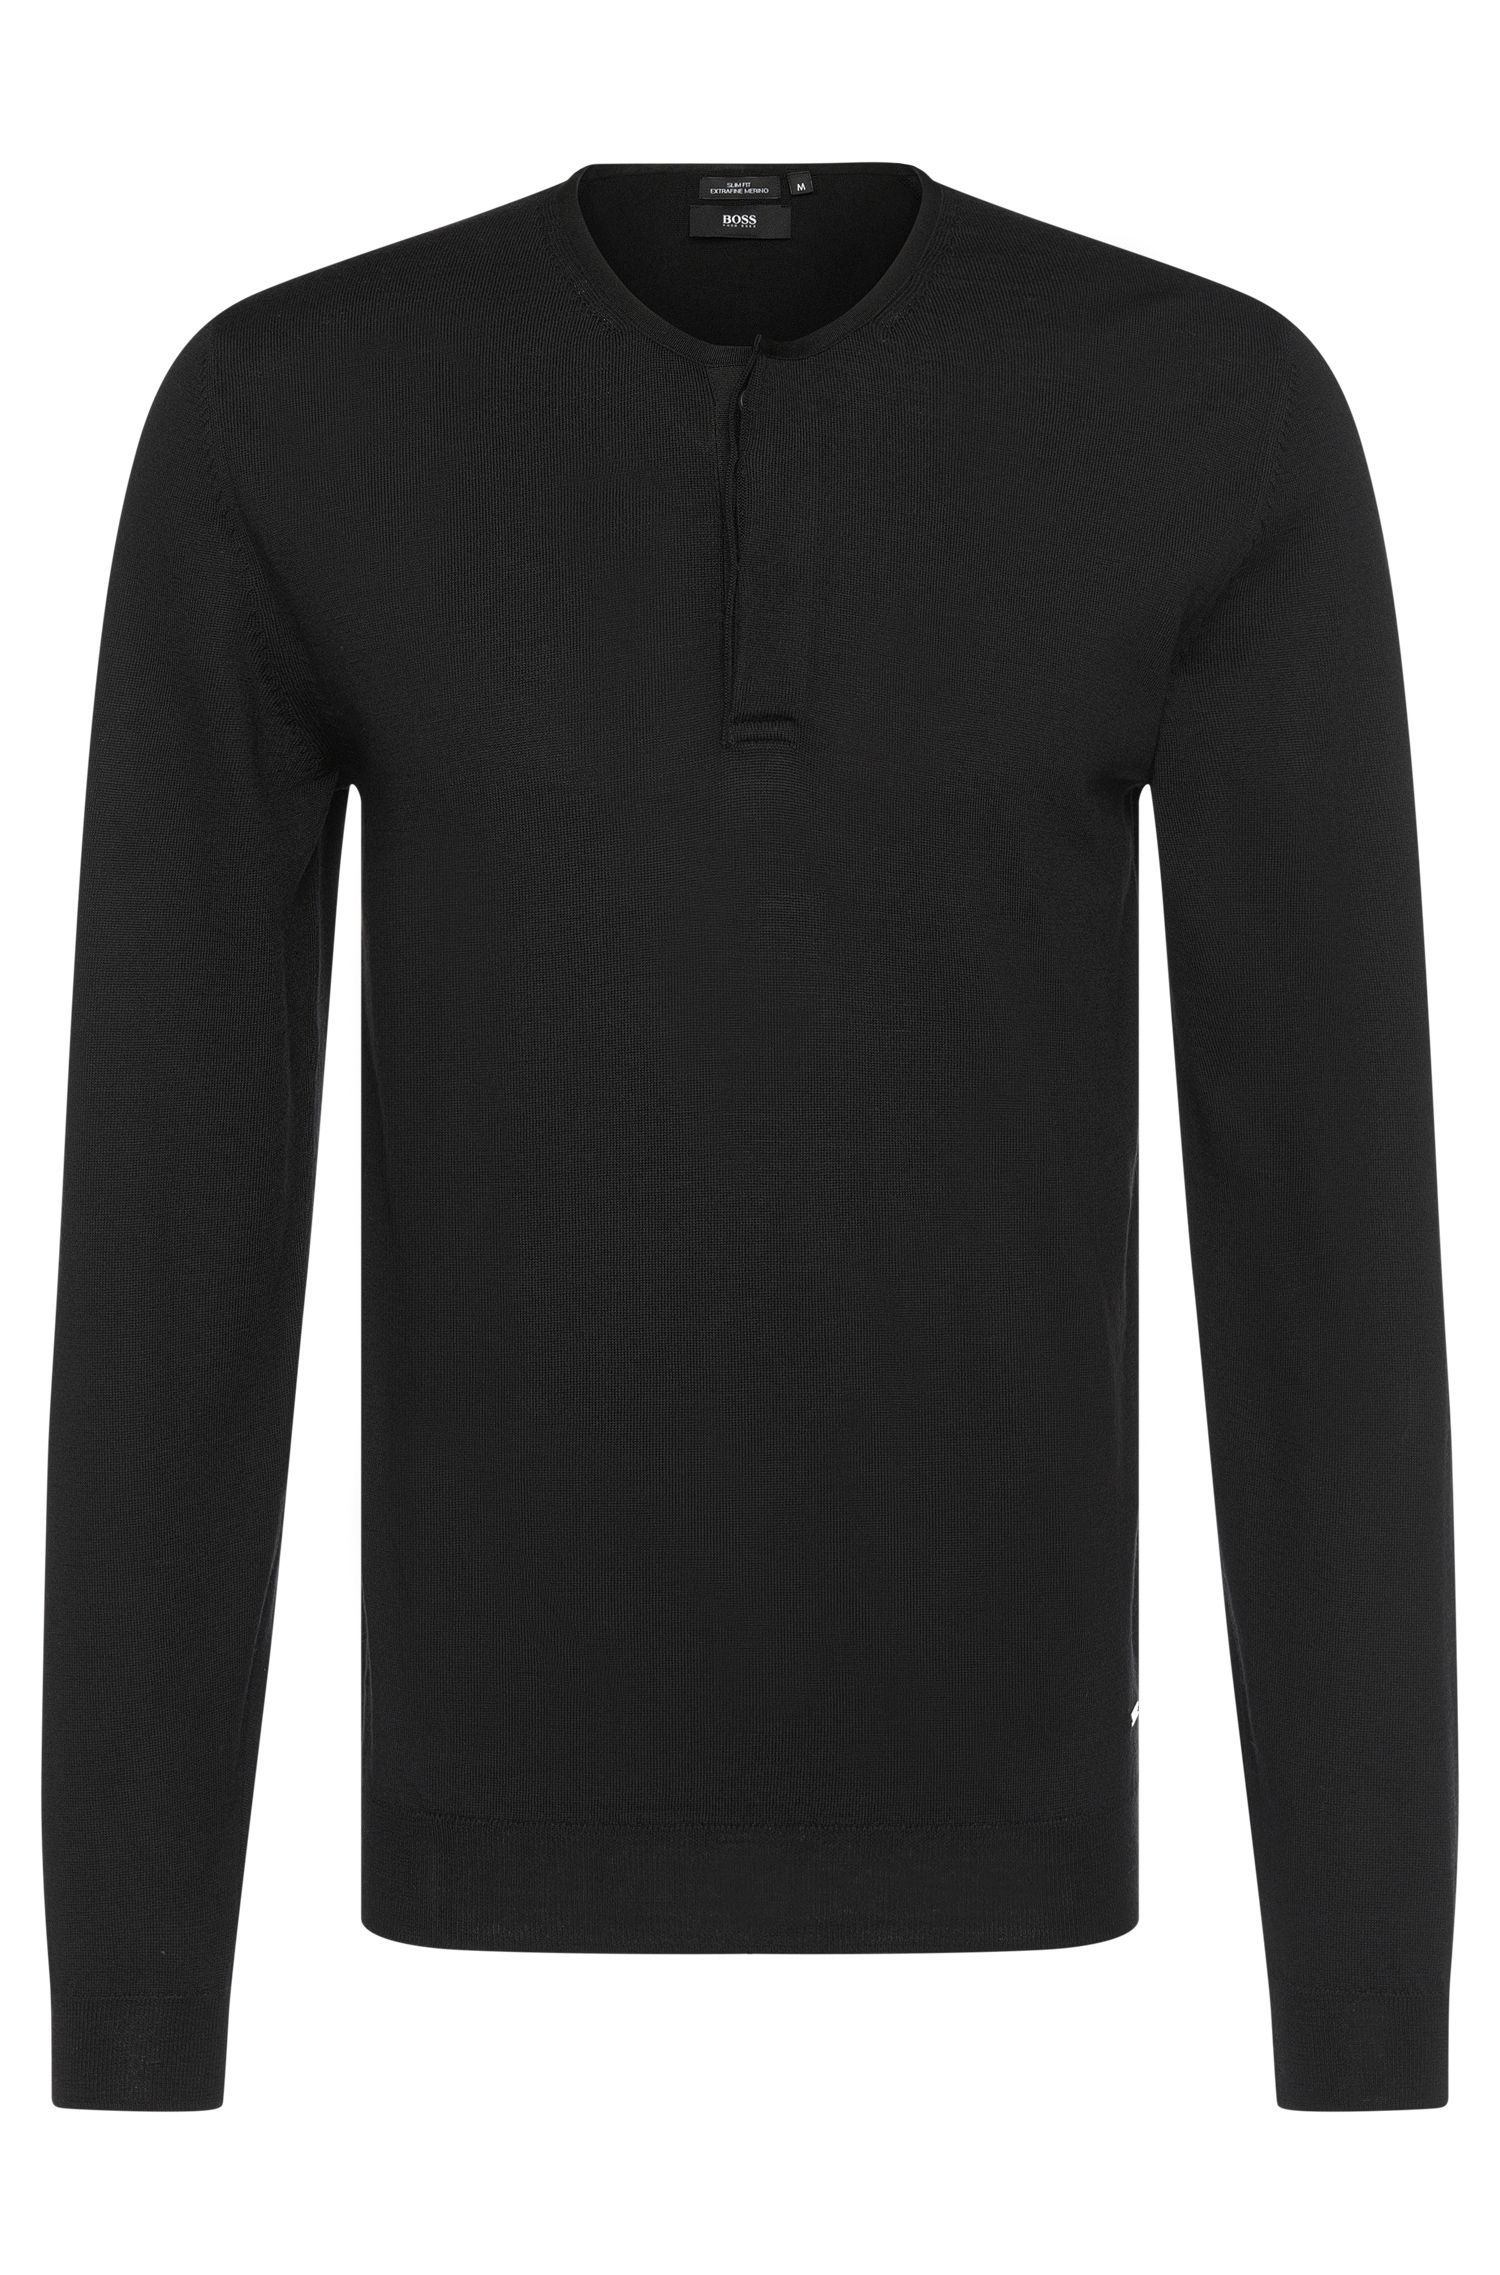 'Isaac' | Extra Fine Merino Virgin Wool Henley Sweater